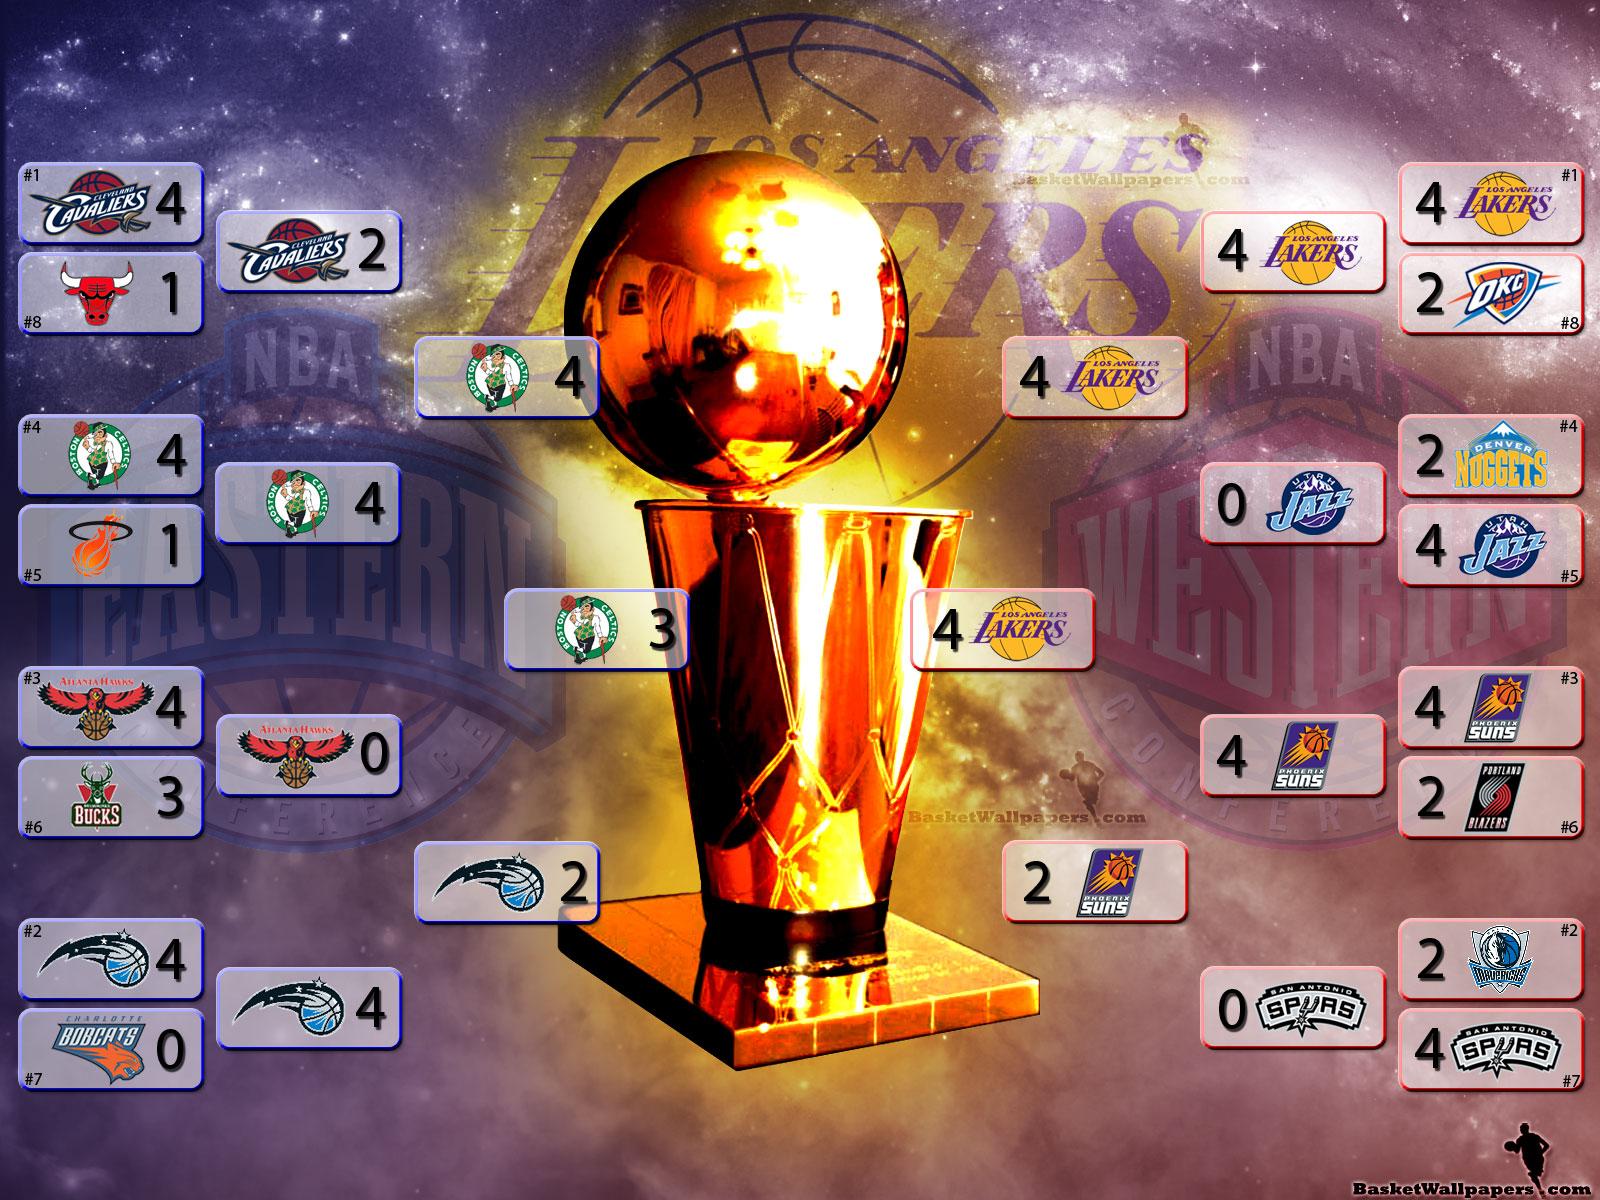 LA Lakers 2010 NBA Champions Wallpaper | Basketball ...